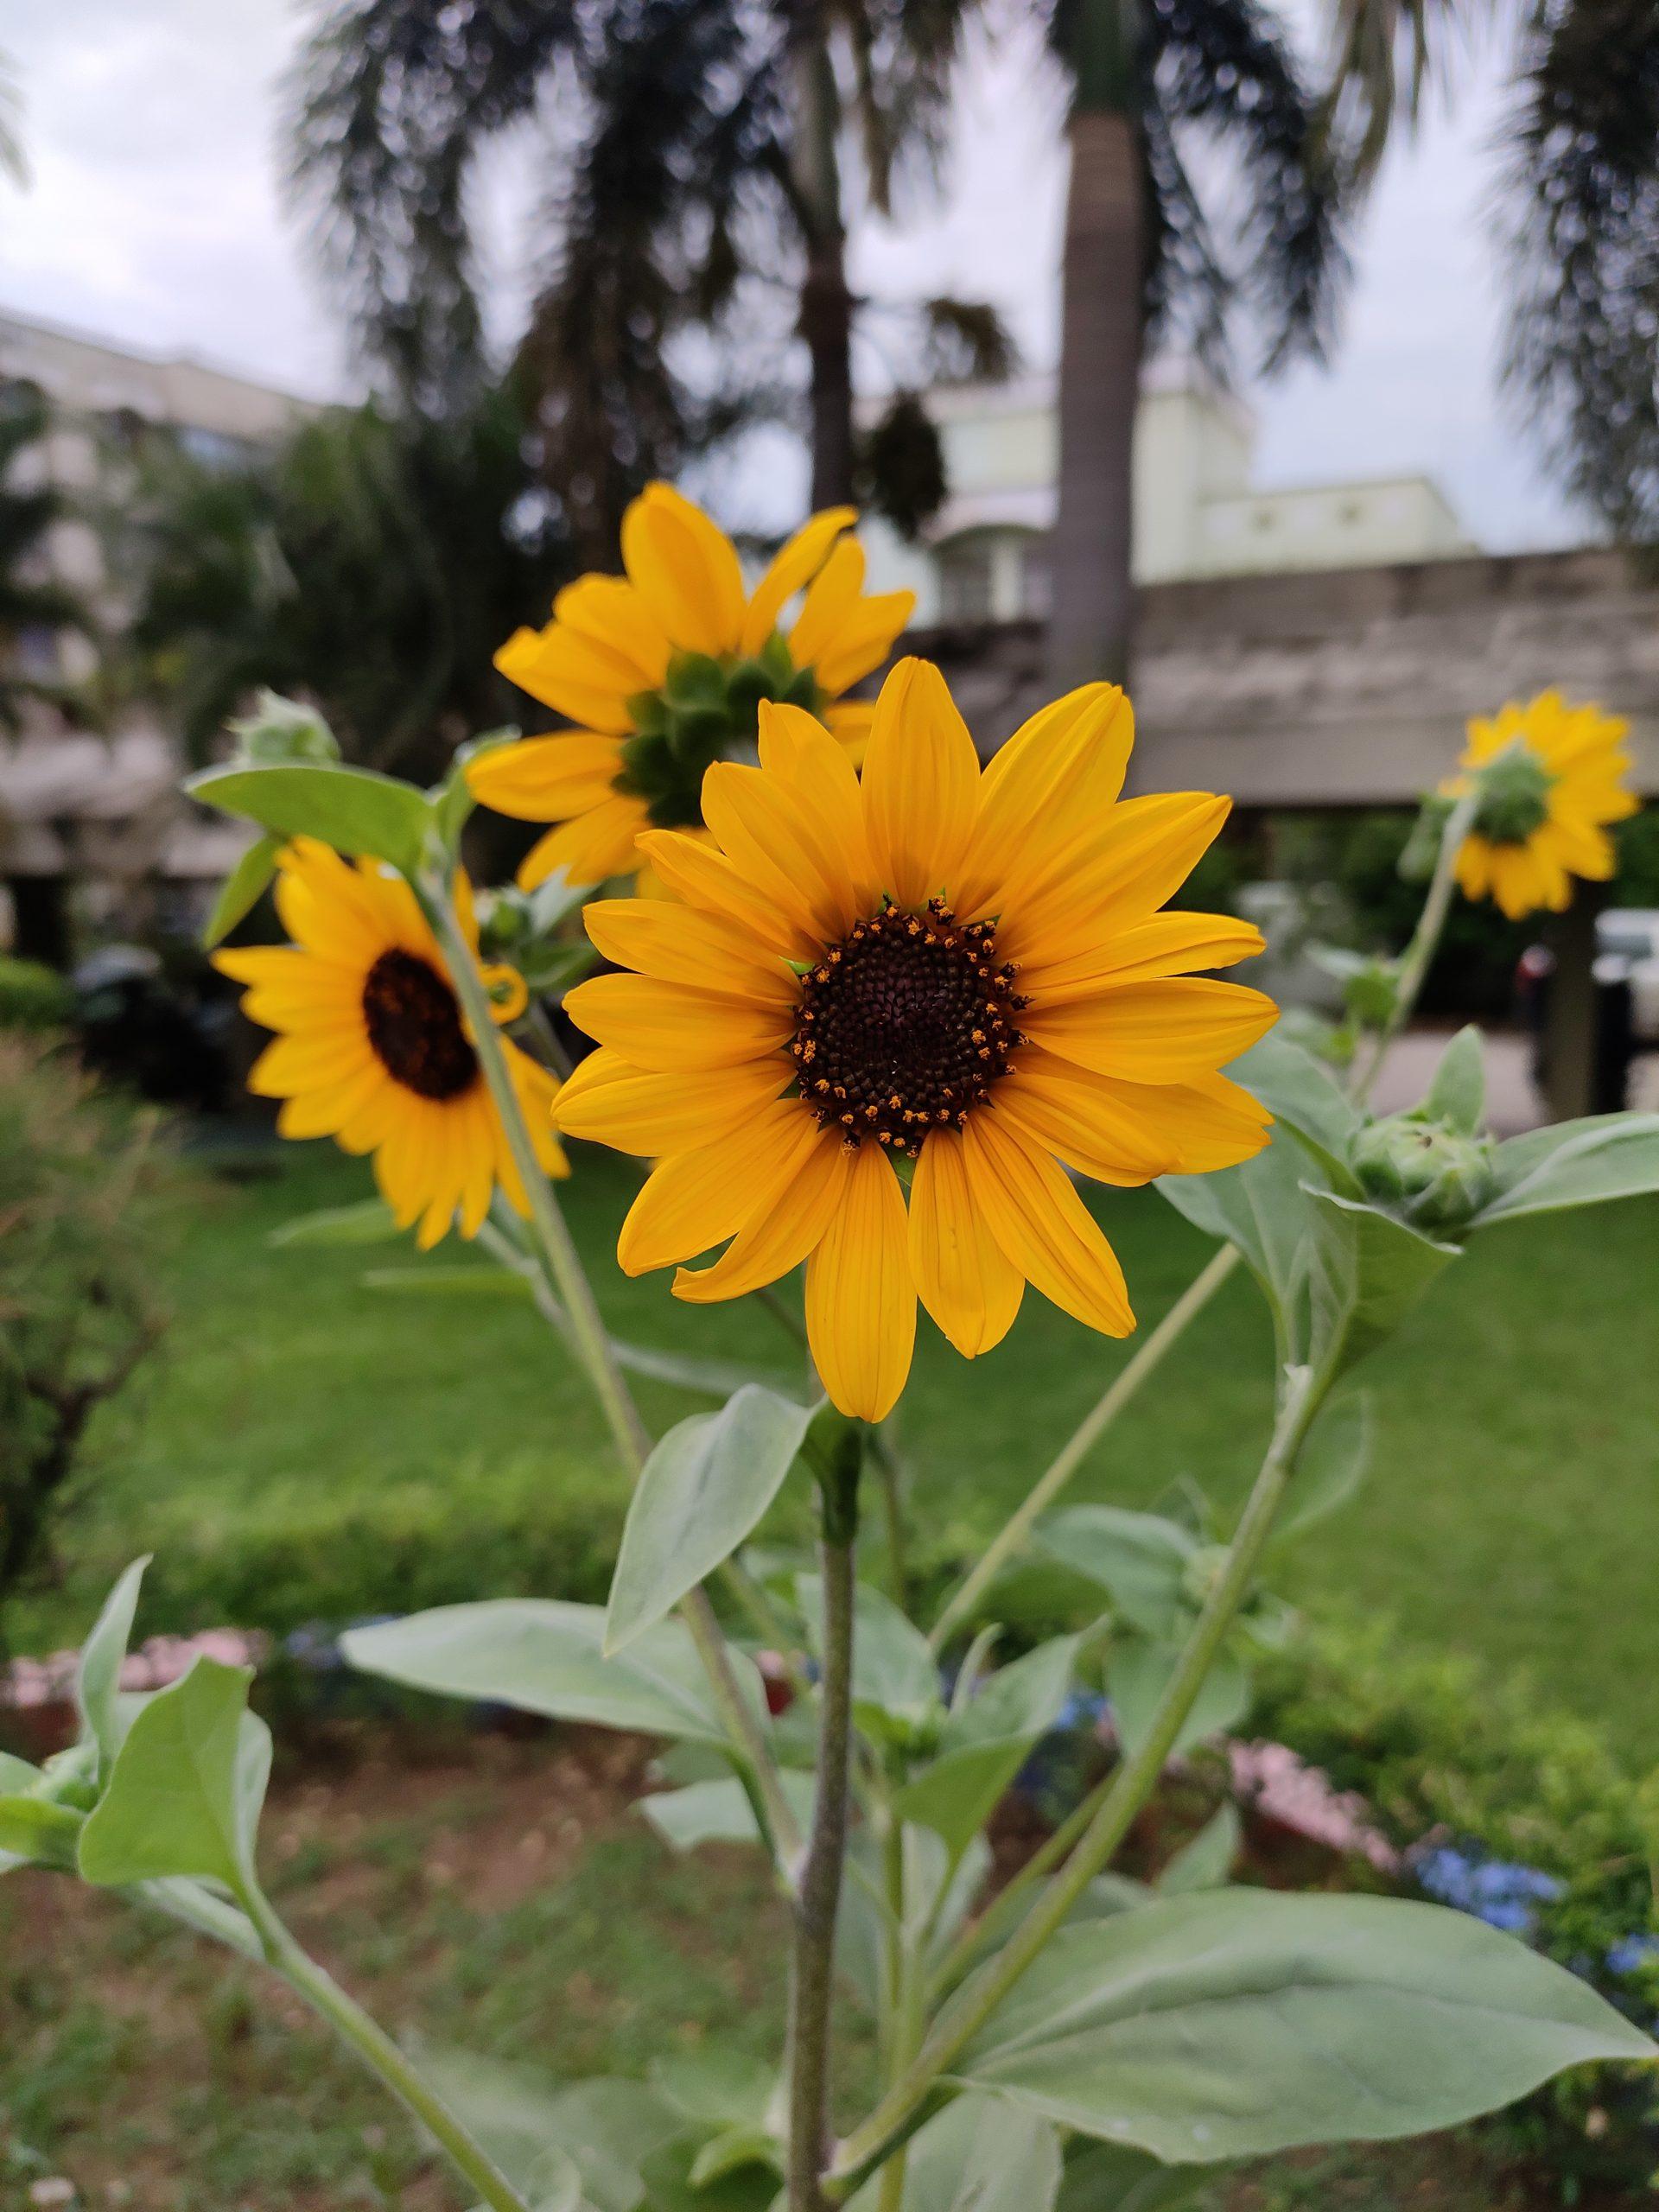 A sunflower plant